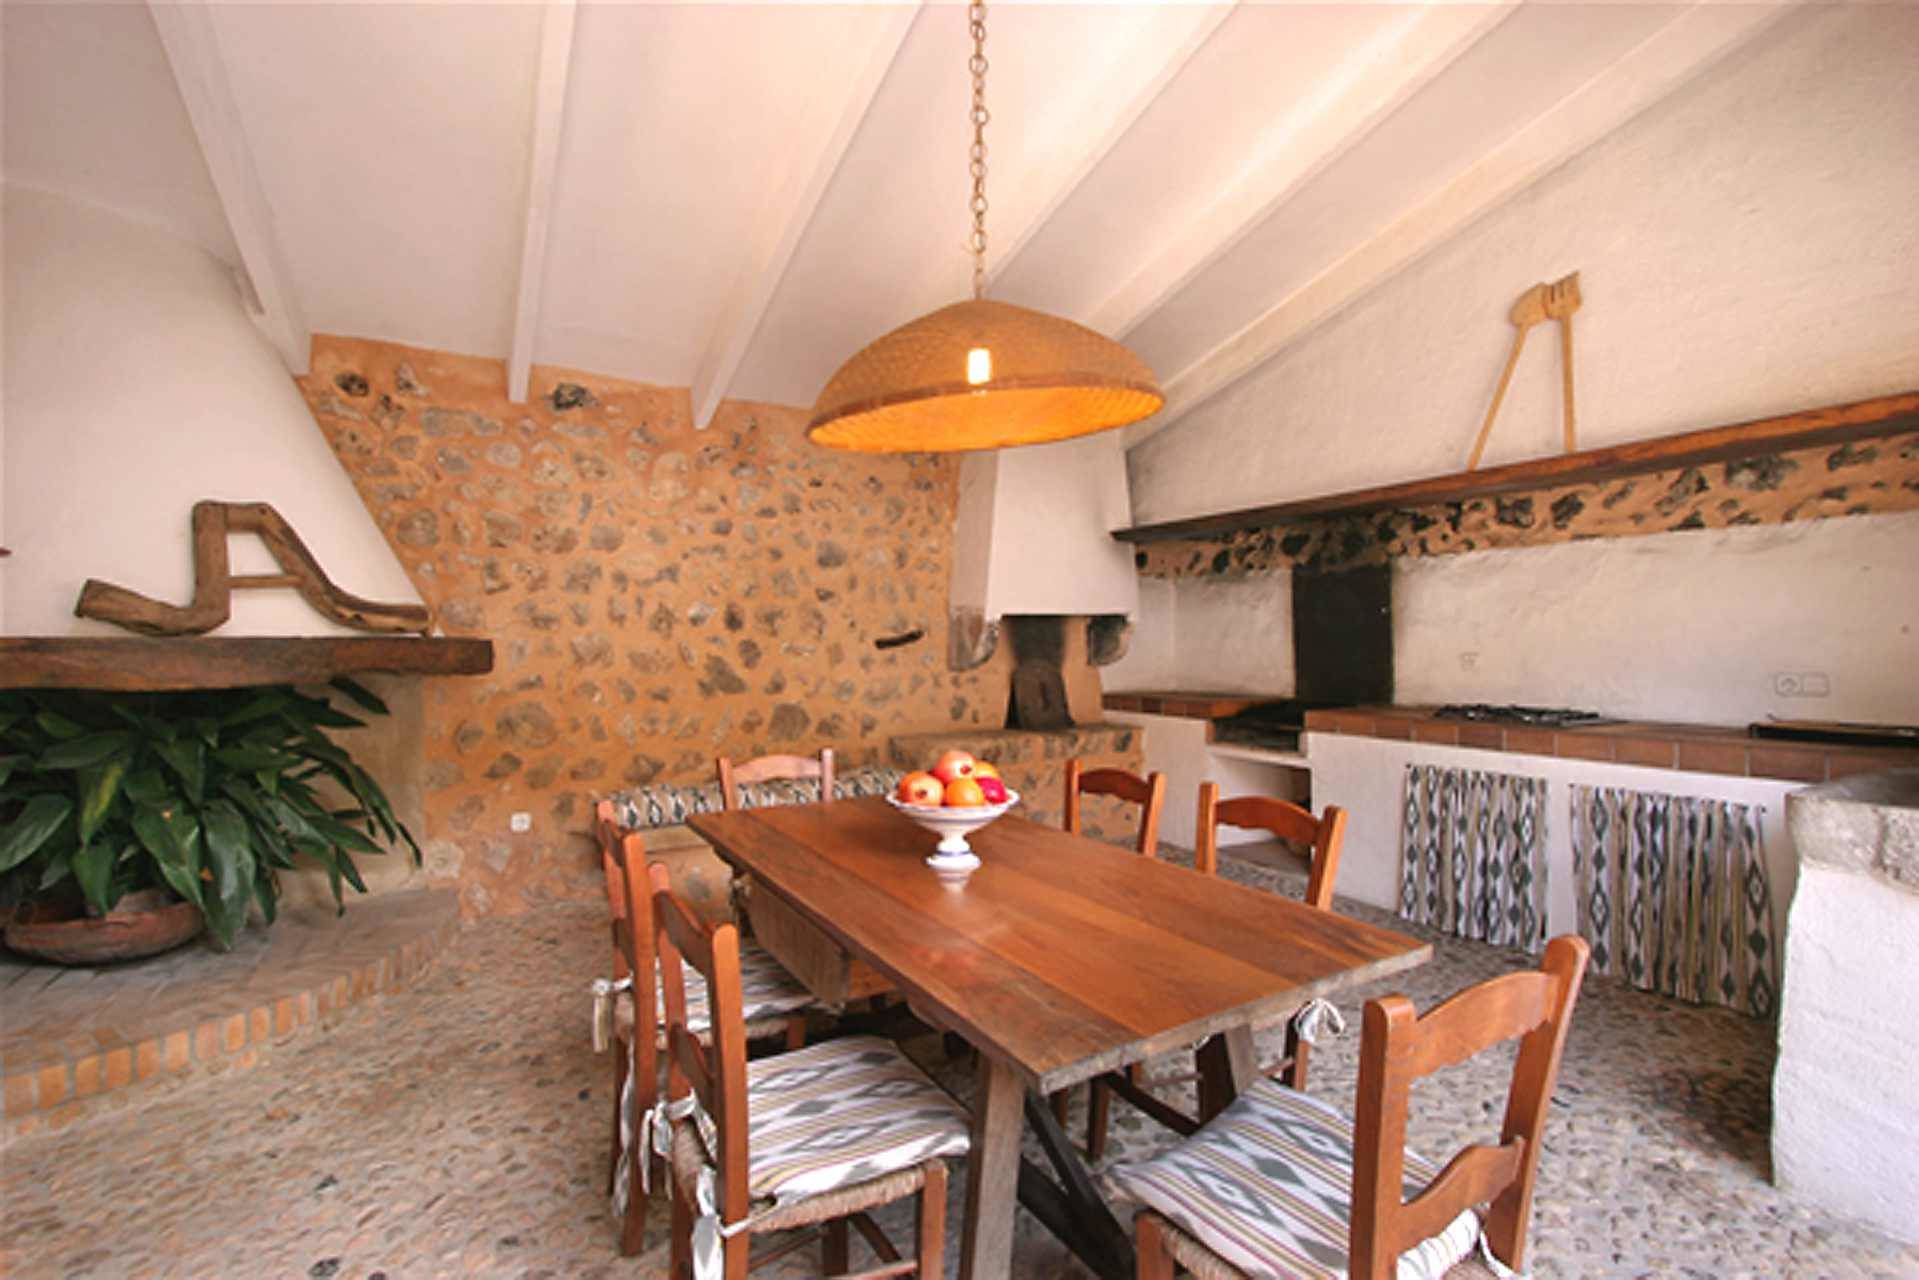 01-06 Charming Holiday Home Mallorca north Bild 5